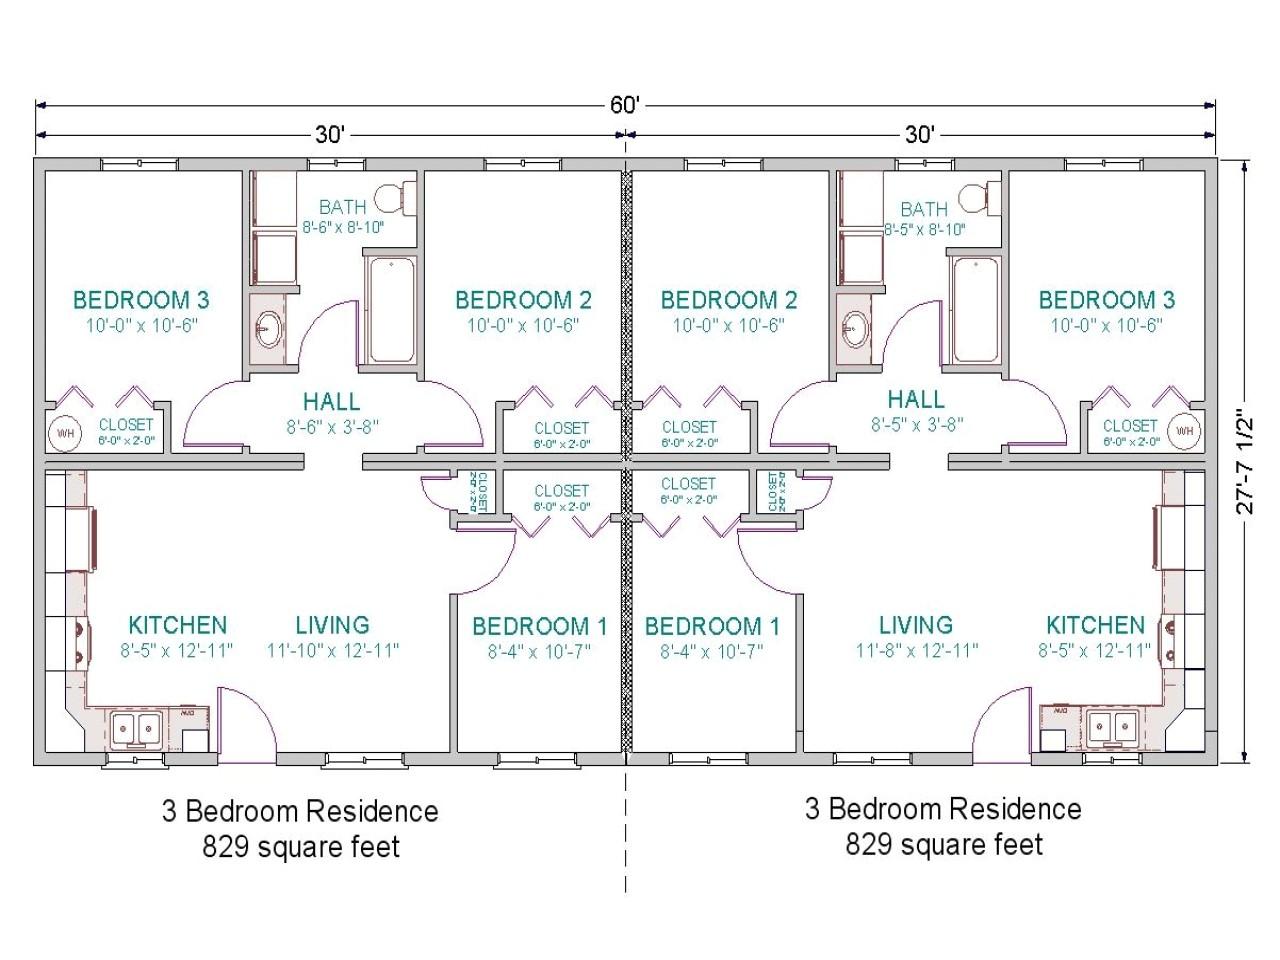 Duplex Home Design Plans 3 Bedroom Duplex Floor Plans Simple 3 Bedroom House Plans